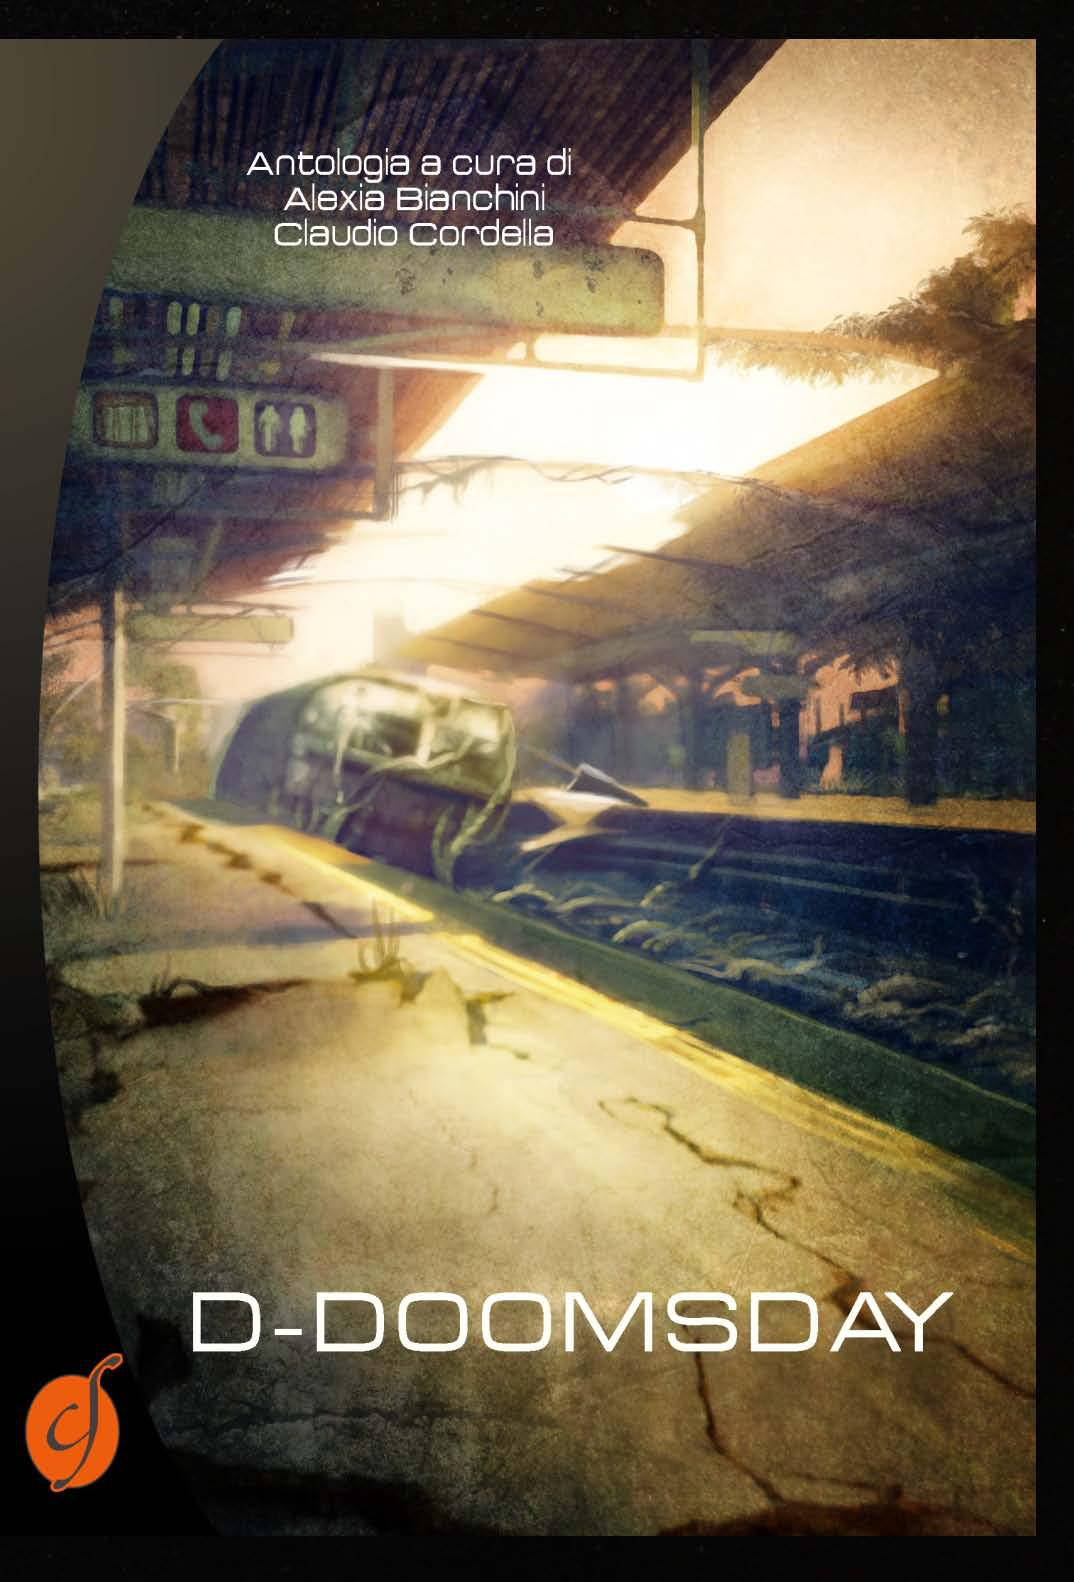 D-Doomsday